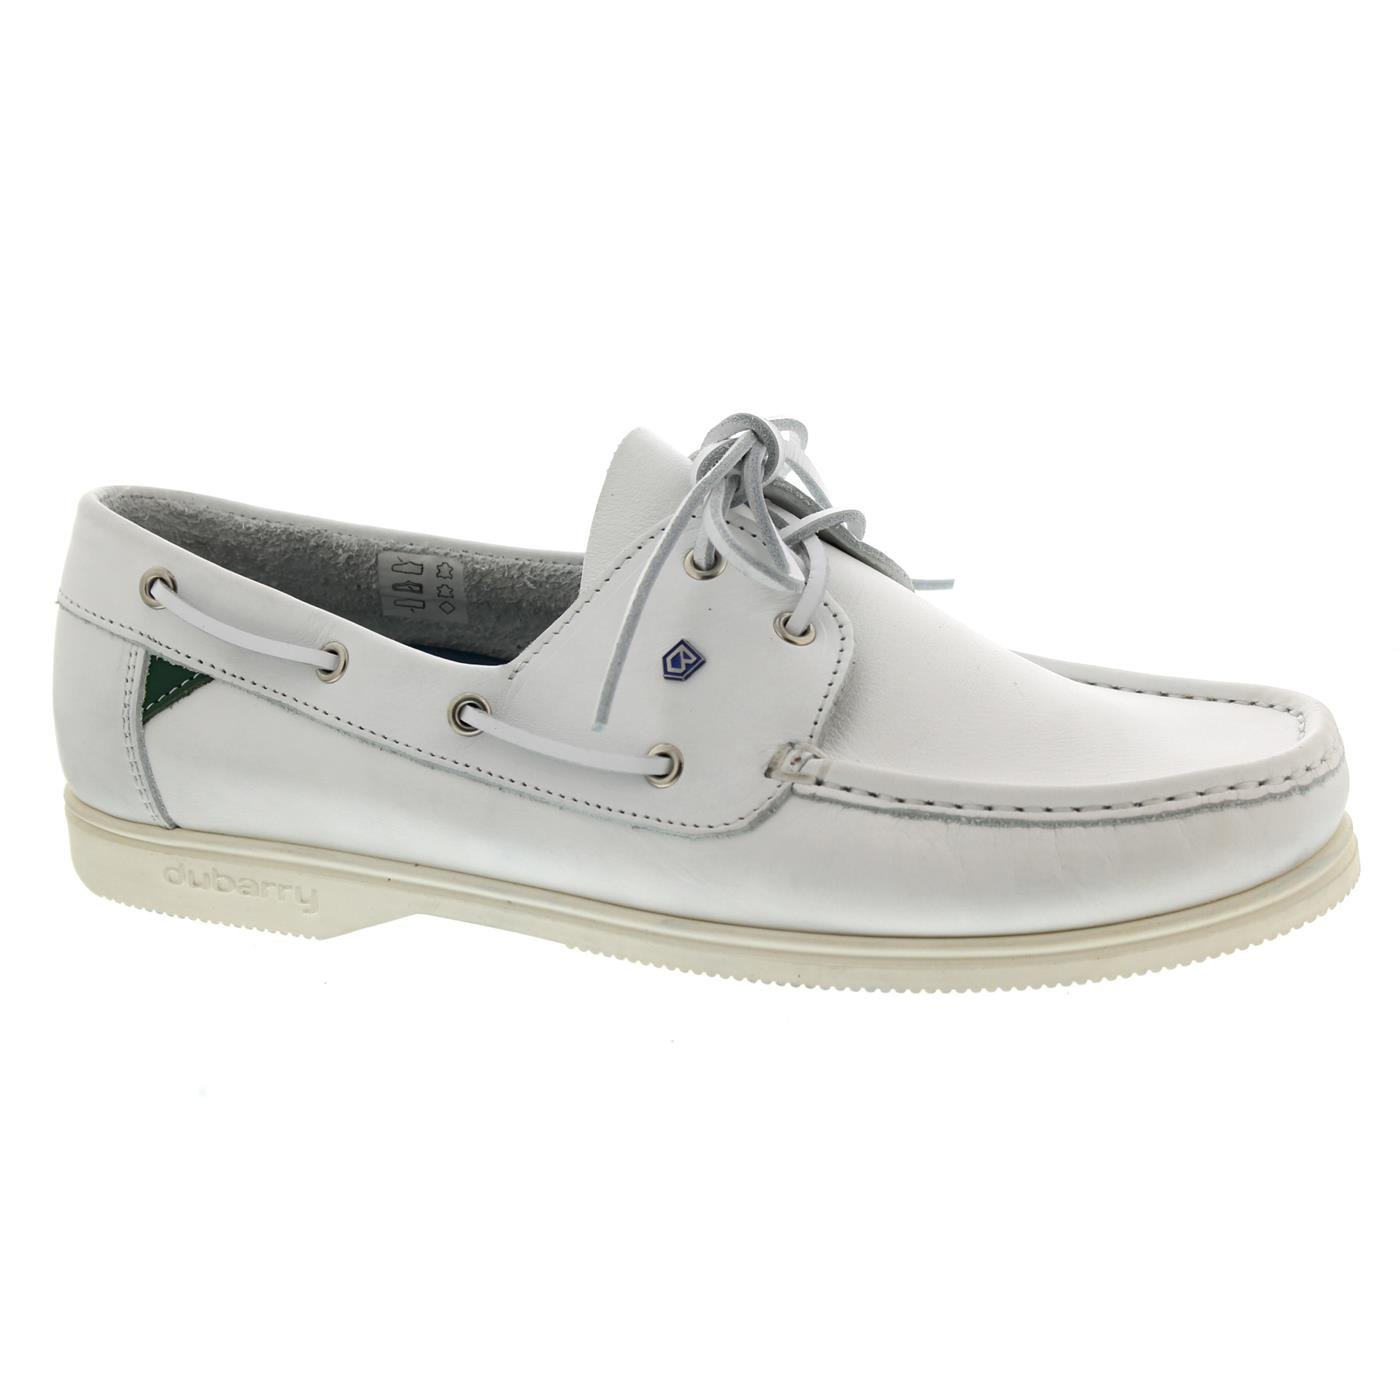 Dubarry Admirals, White, Dry Fast - Dry Soft Leder, (Glattleder) 3331-00  44 EU|Wei?